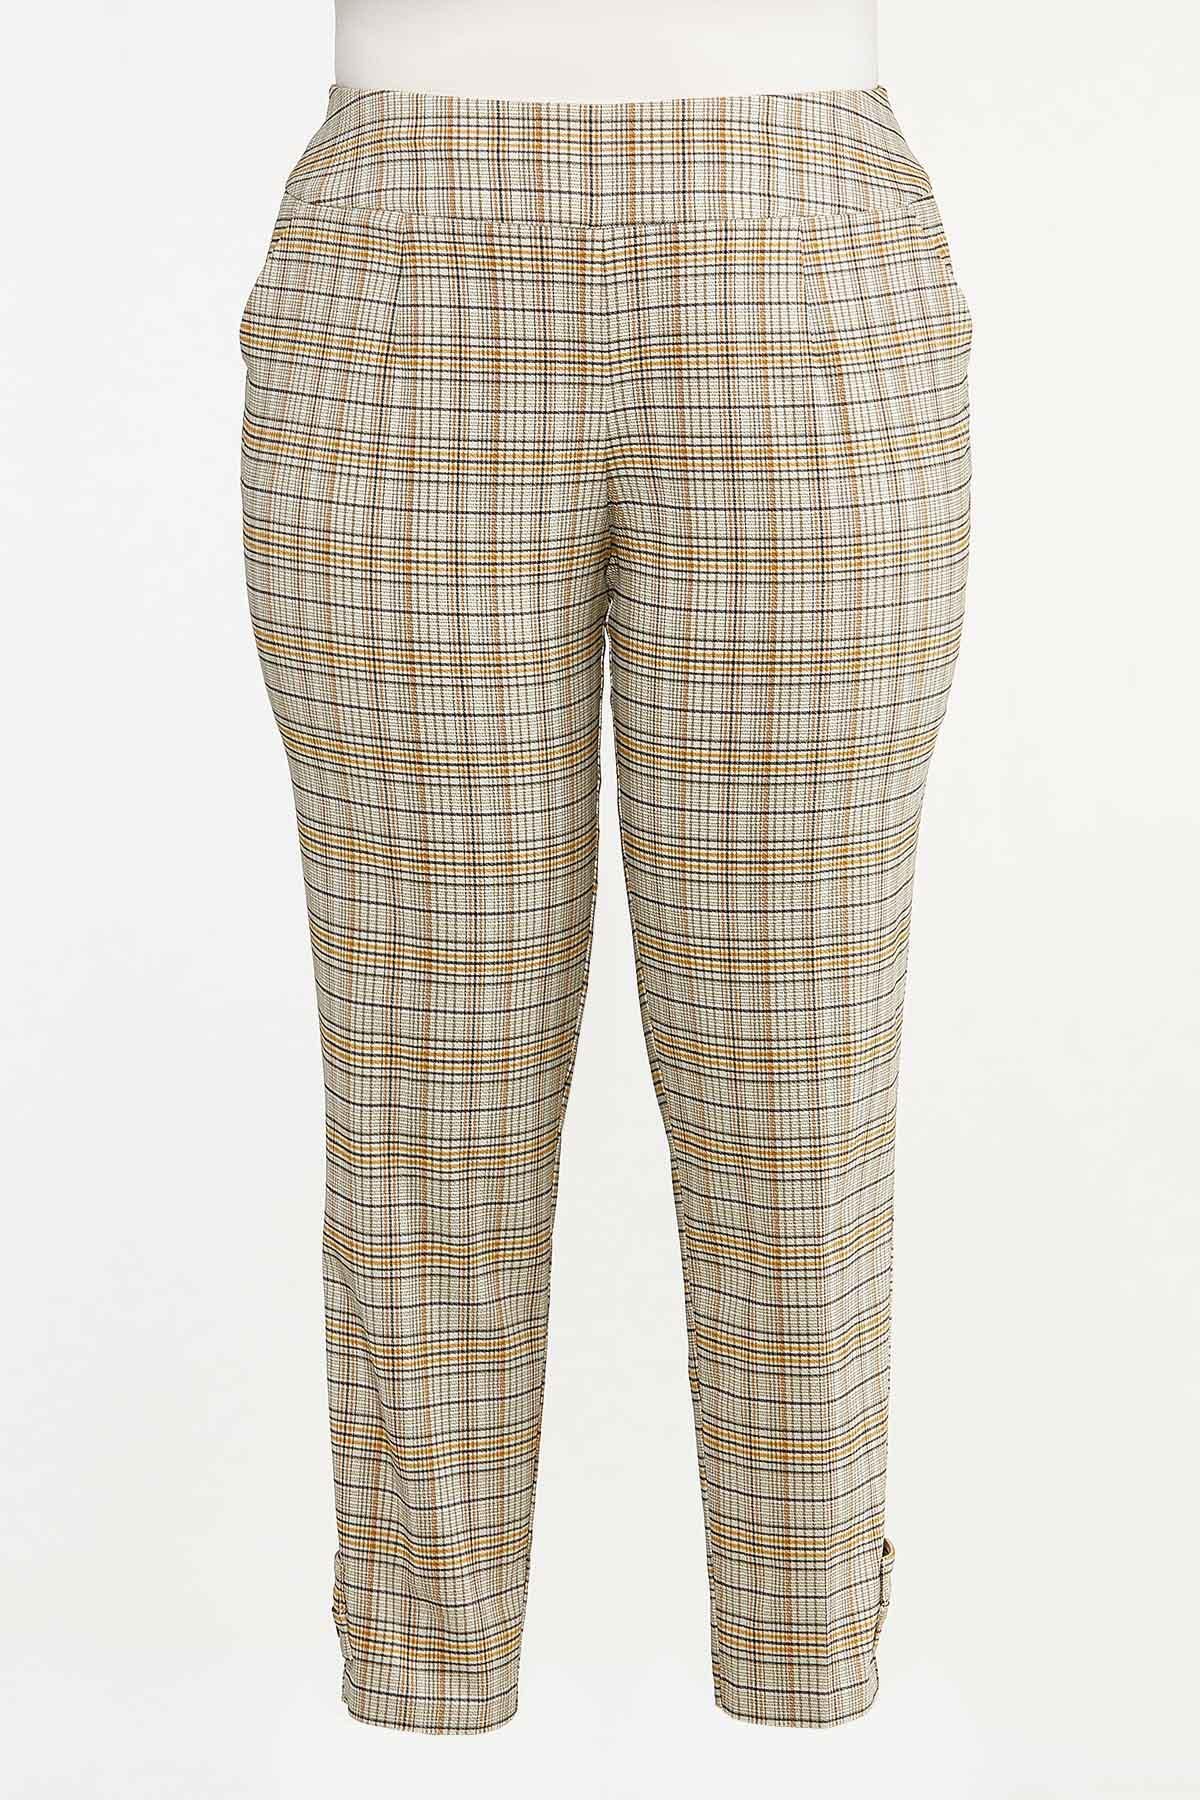 Plus Size Gold Bengaline Pants